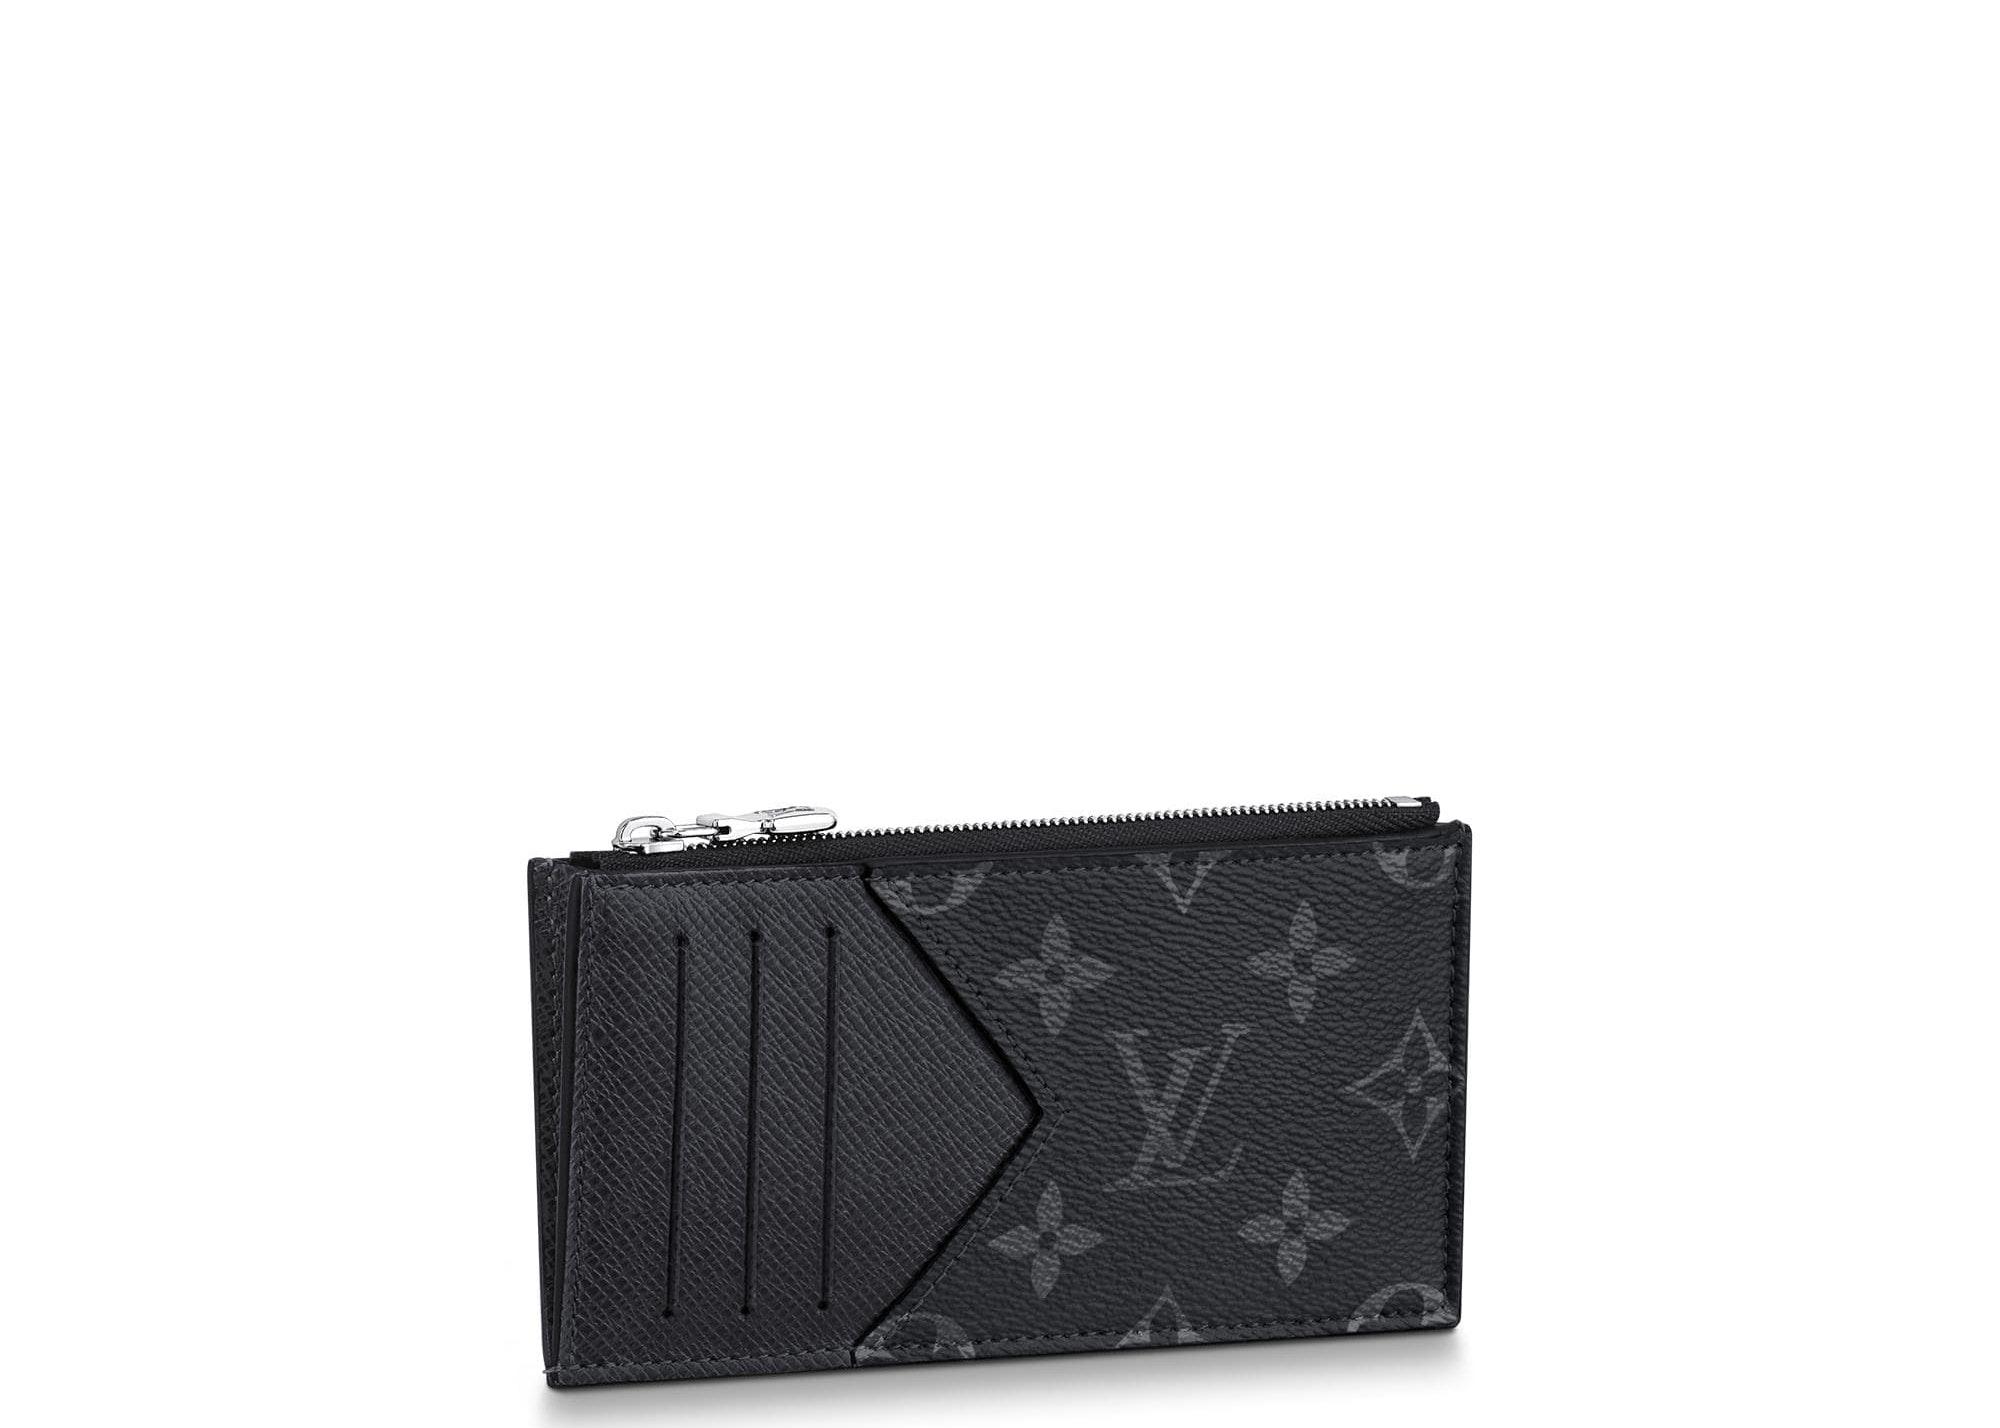 Louis Vuitton Coin Card Holder Monogram Eclipse Taiga Black